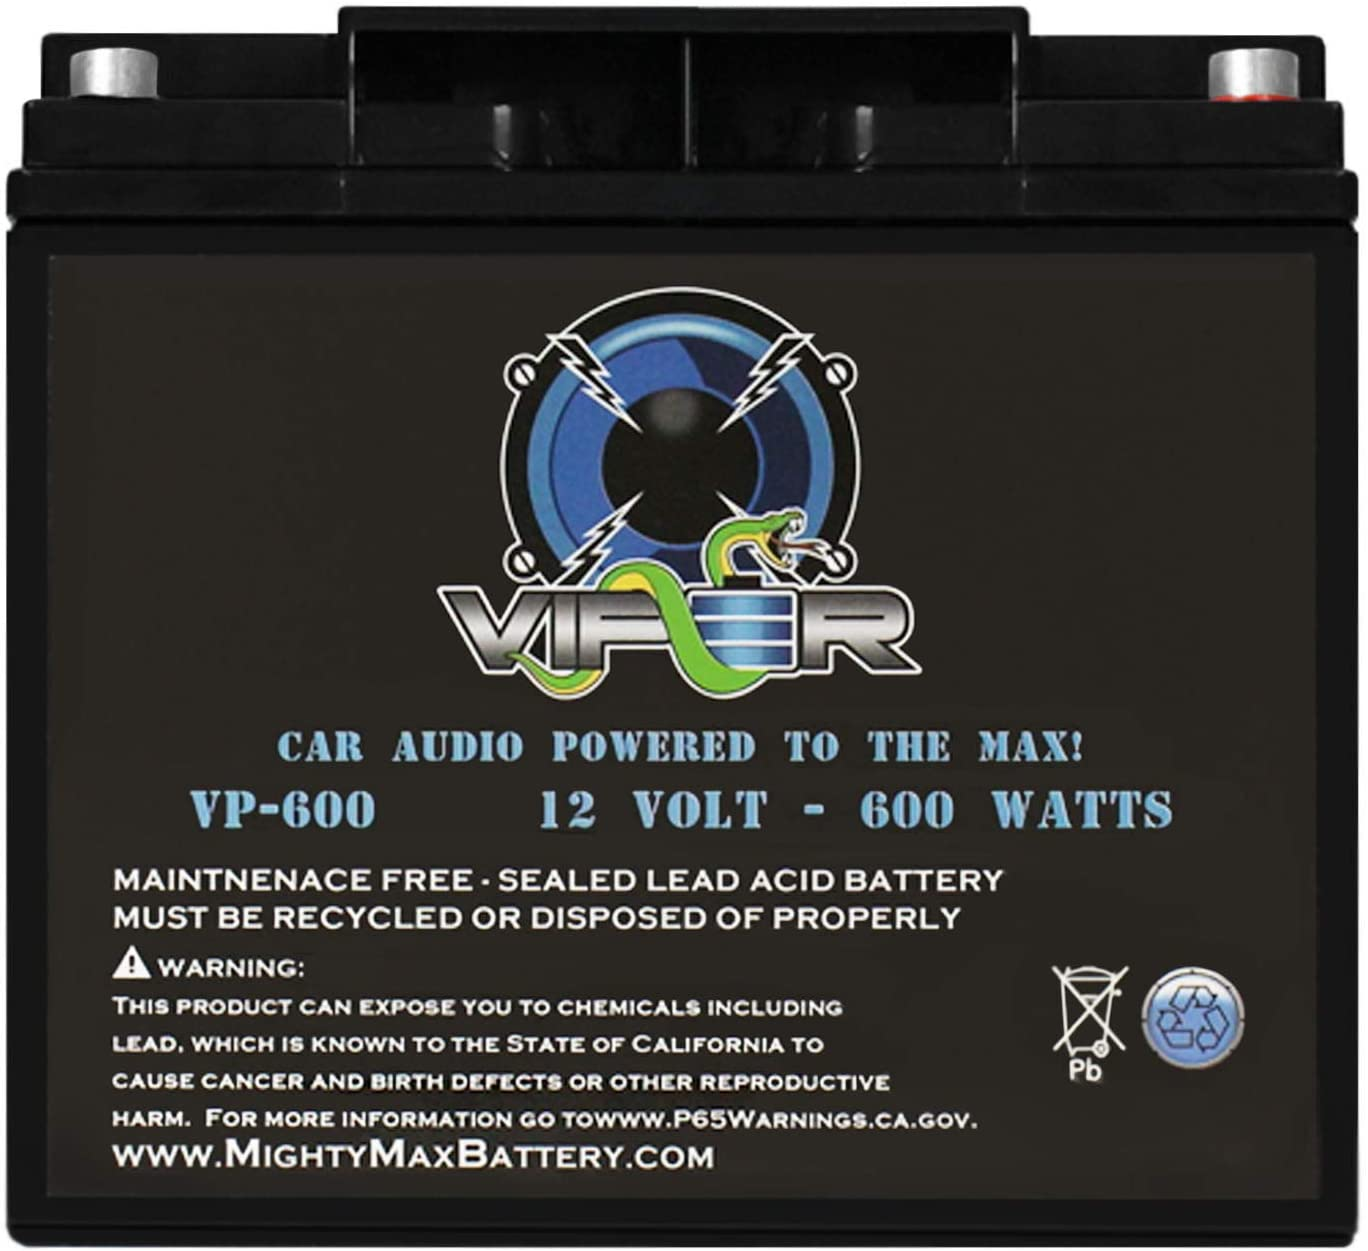 Mighty Max Battery Viper VP-600 Watt Car Audio Battery